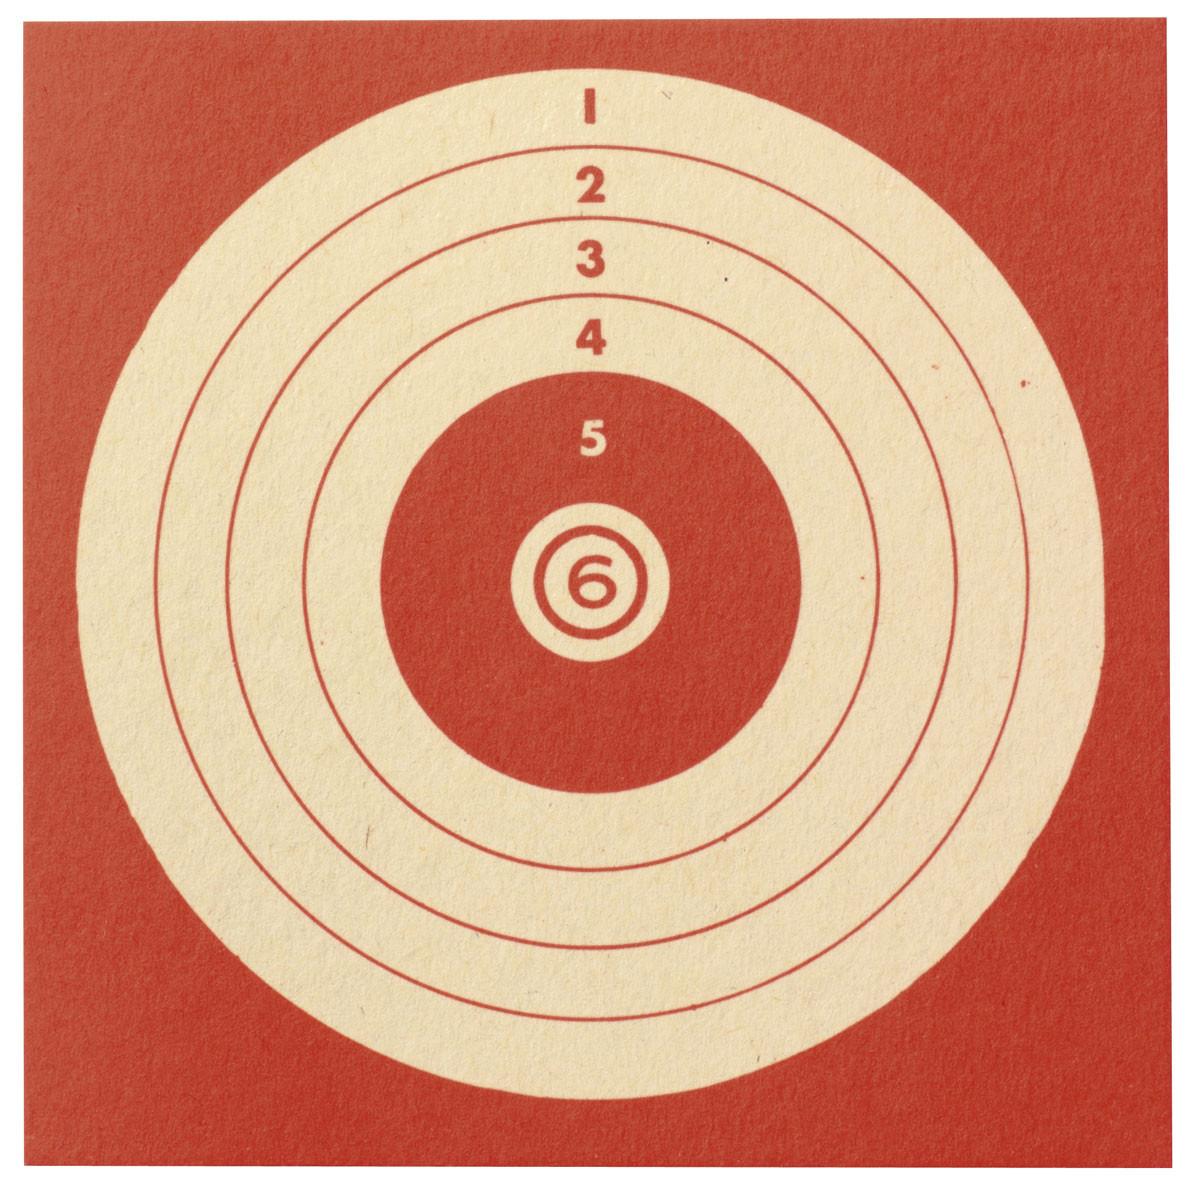 Cibles de tir cartonnées 10X10cm- Paquet de 100-Ref 1851